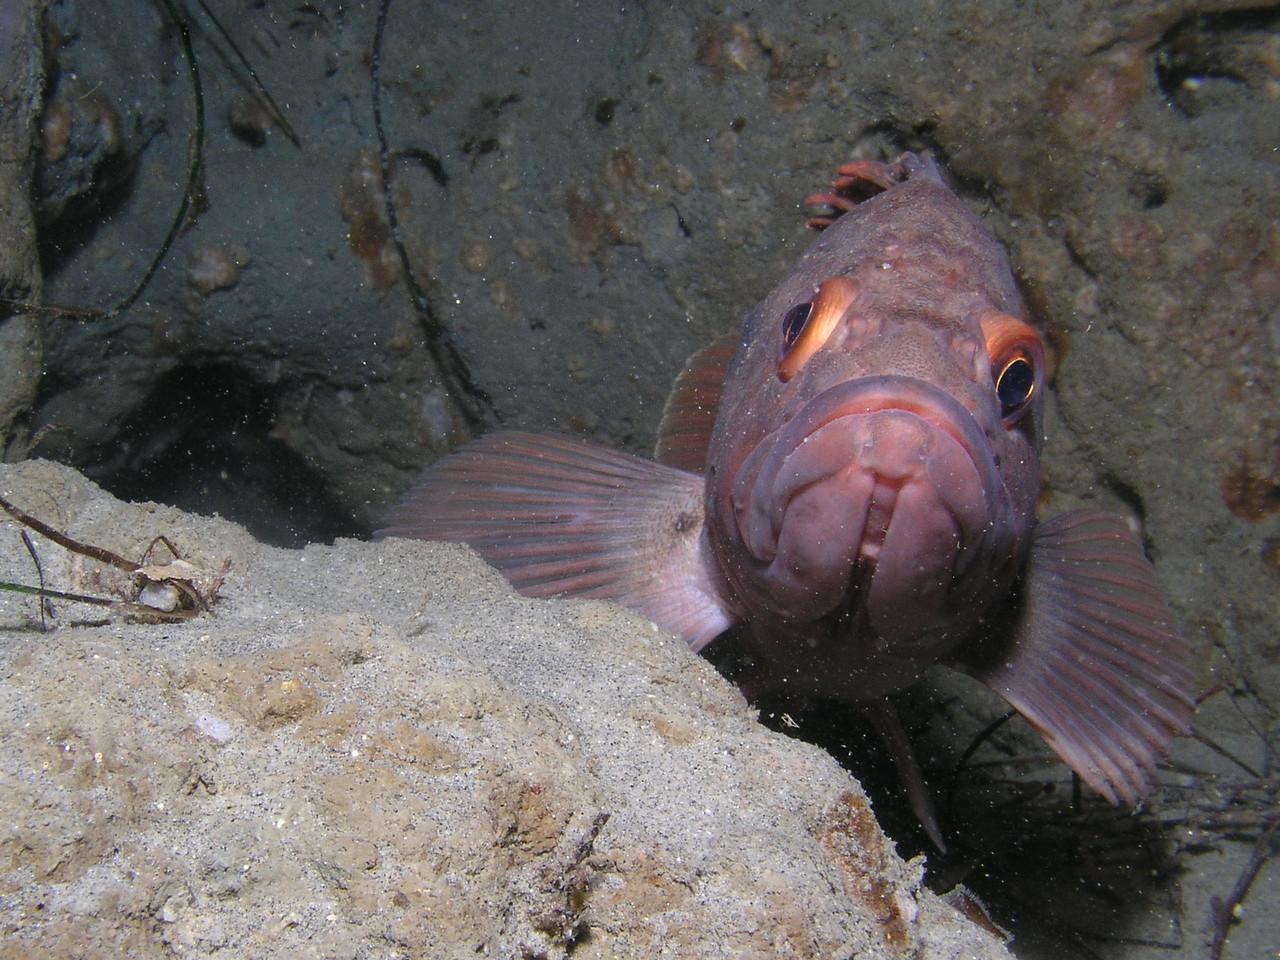 Jen Tople 9/17/2007 La Jolla Shores Vallecitos Point Rock Fish, probably a Brown Rockfish Oly 5060, ikelite strobe